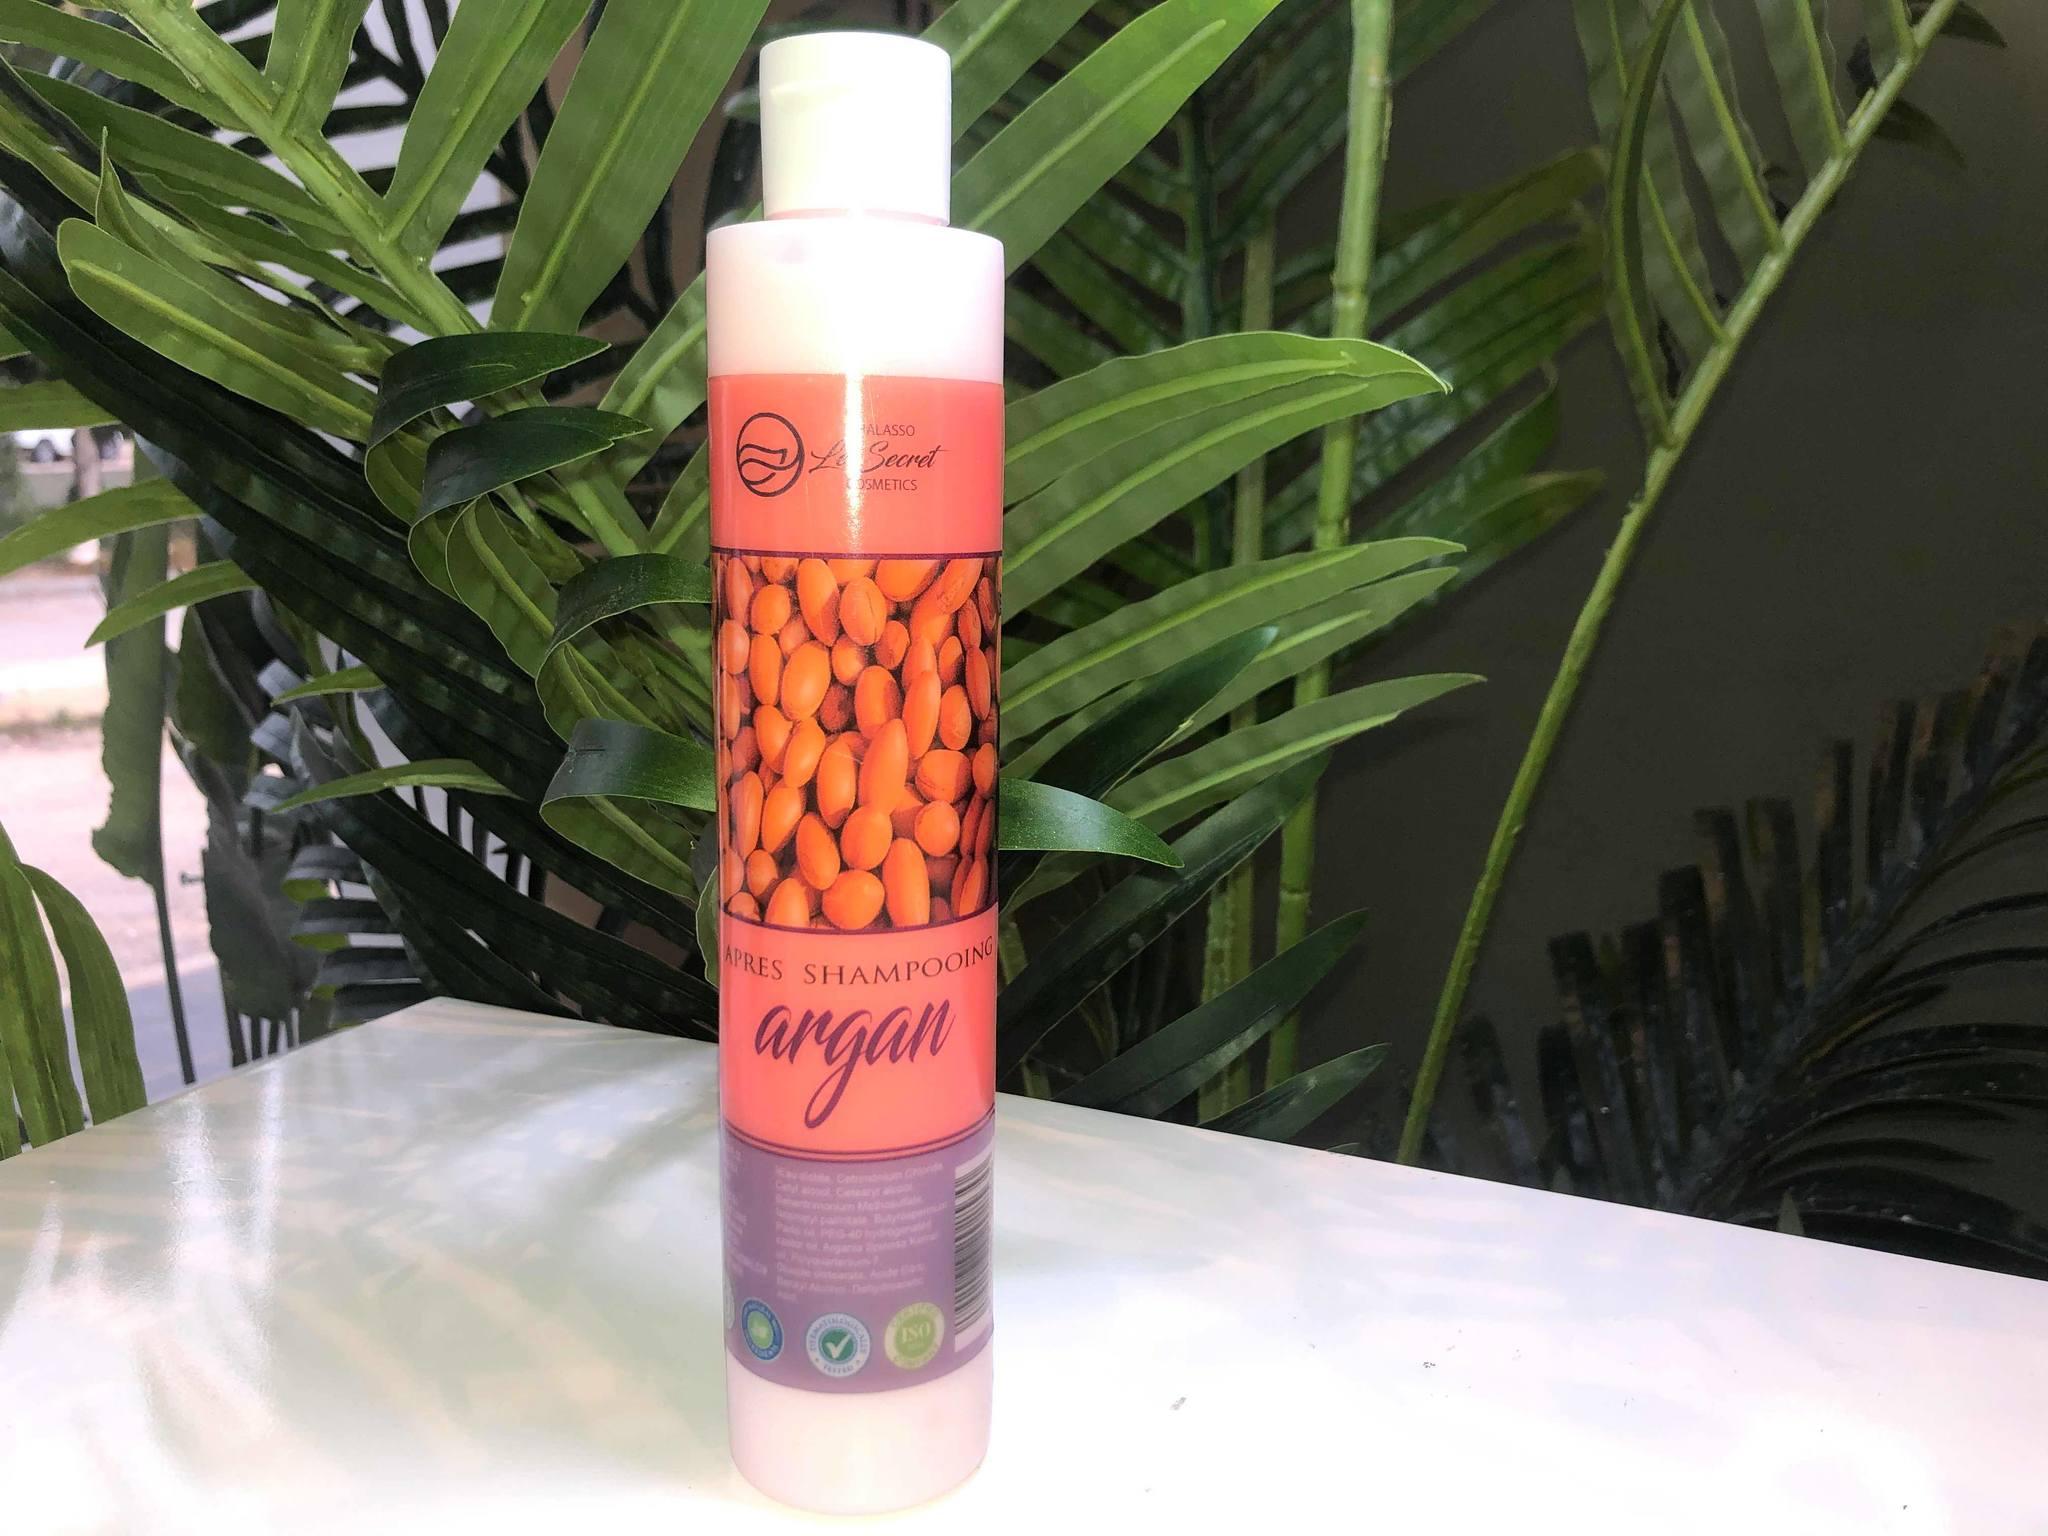 Le Secret Thalasso Apres Shampoo Argan